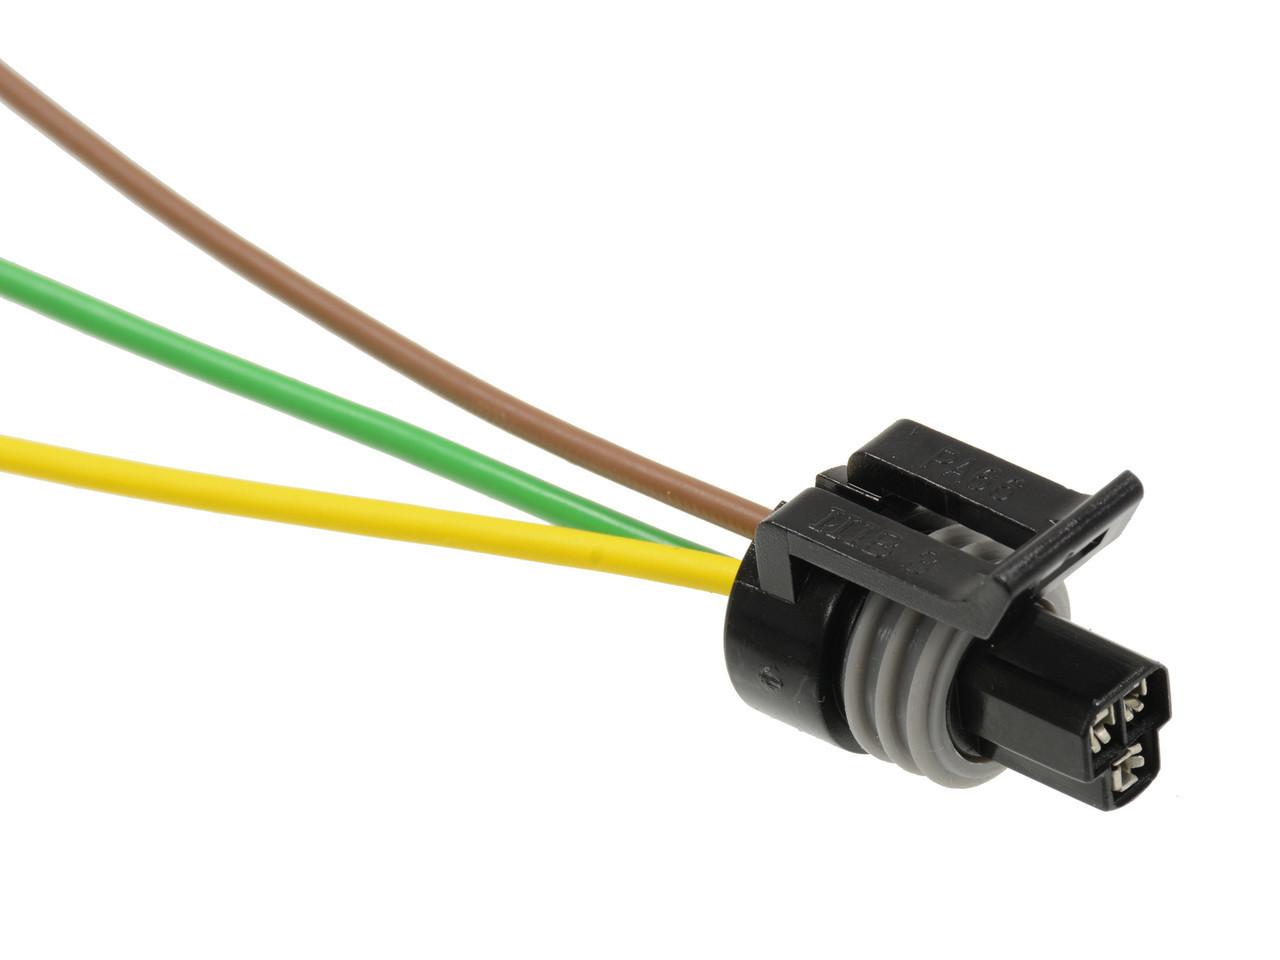 Ls1 Coolant Temperature Temp Sensor Connector Harness 3 Wire Fits Gm Duramax Fuel Filter Water